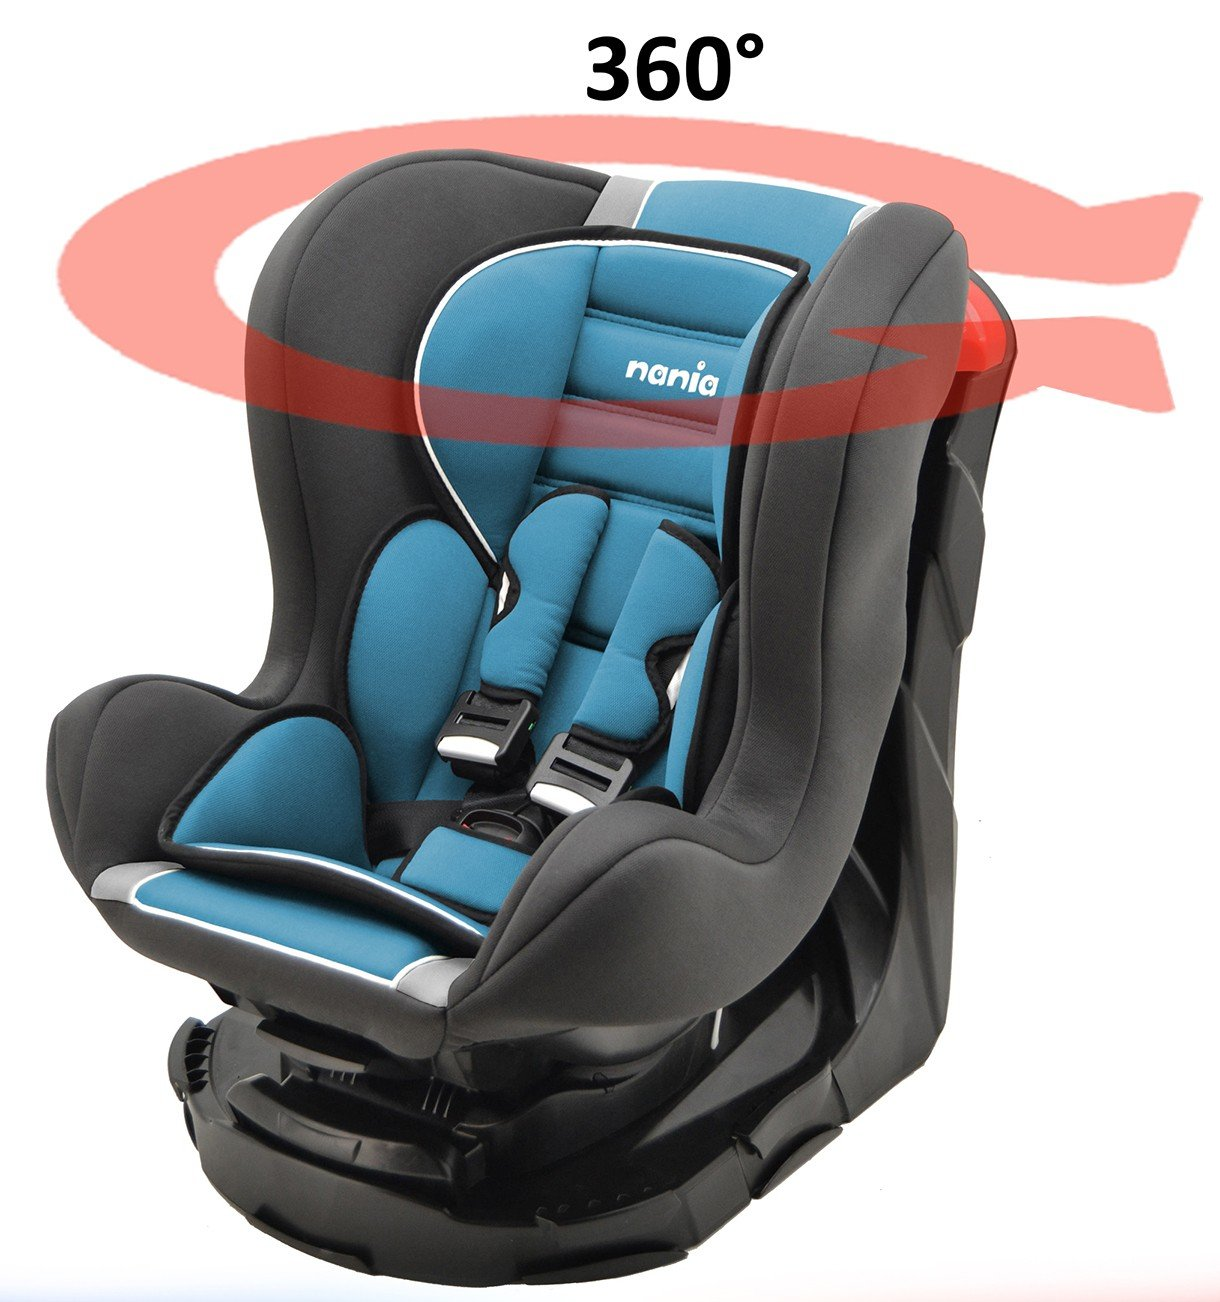 Kinderautositz REVO 360° drehbar und neigbar - gruppen 0+/1-4 farben - Carmin Mycarsit 272129